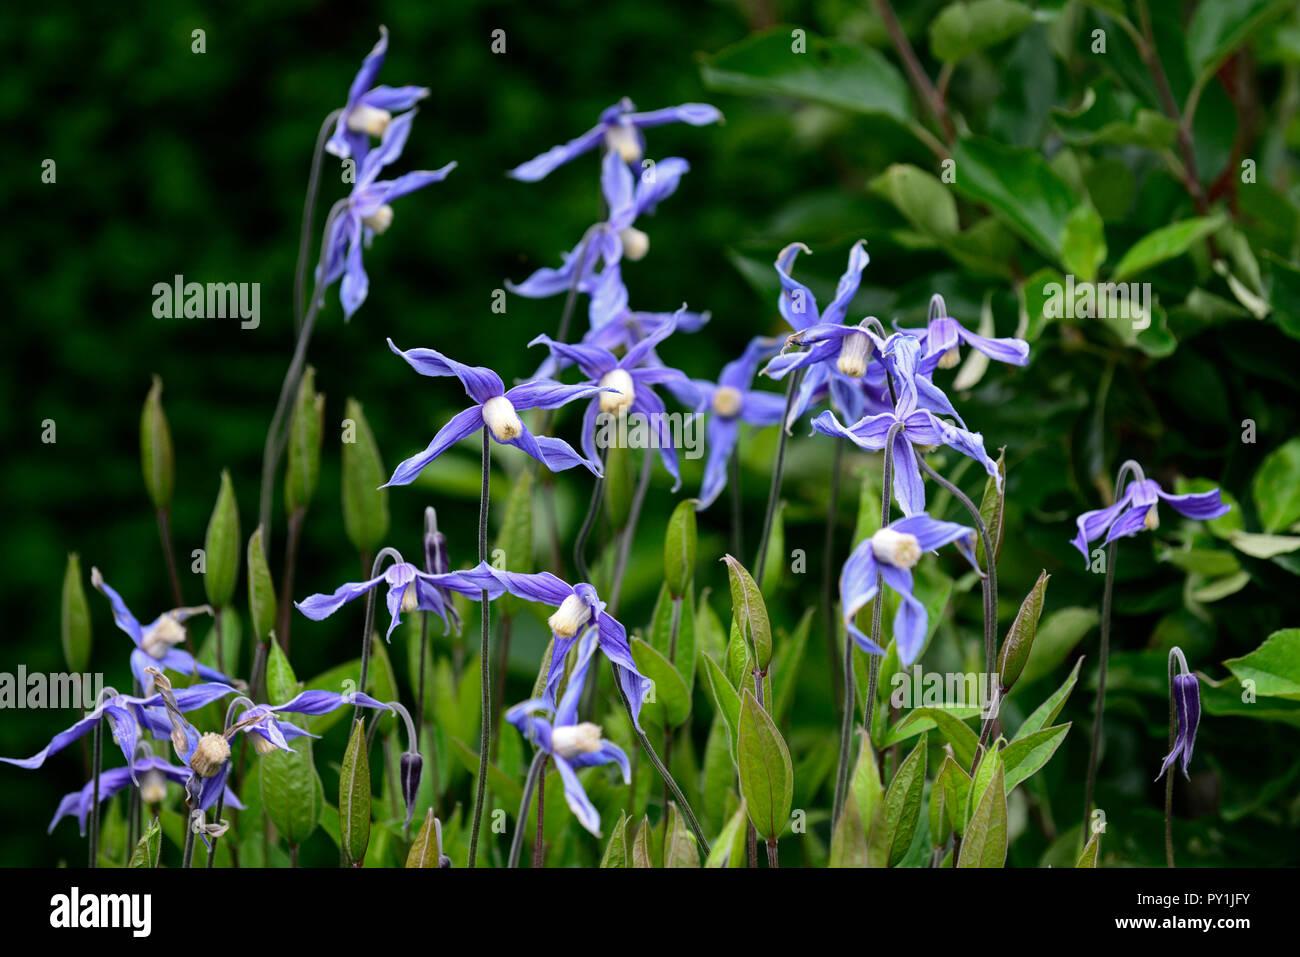 clematis integrifolia,non twining,non climbing,climbing,scrambling,blue flower,flowers,flowering,perennial,RM Floral - Stock Image